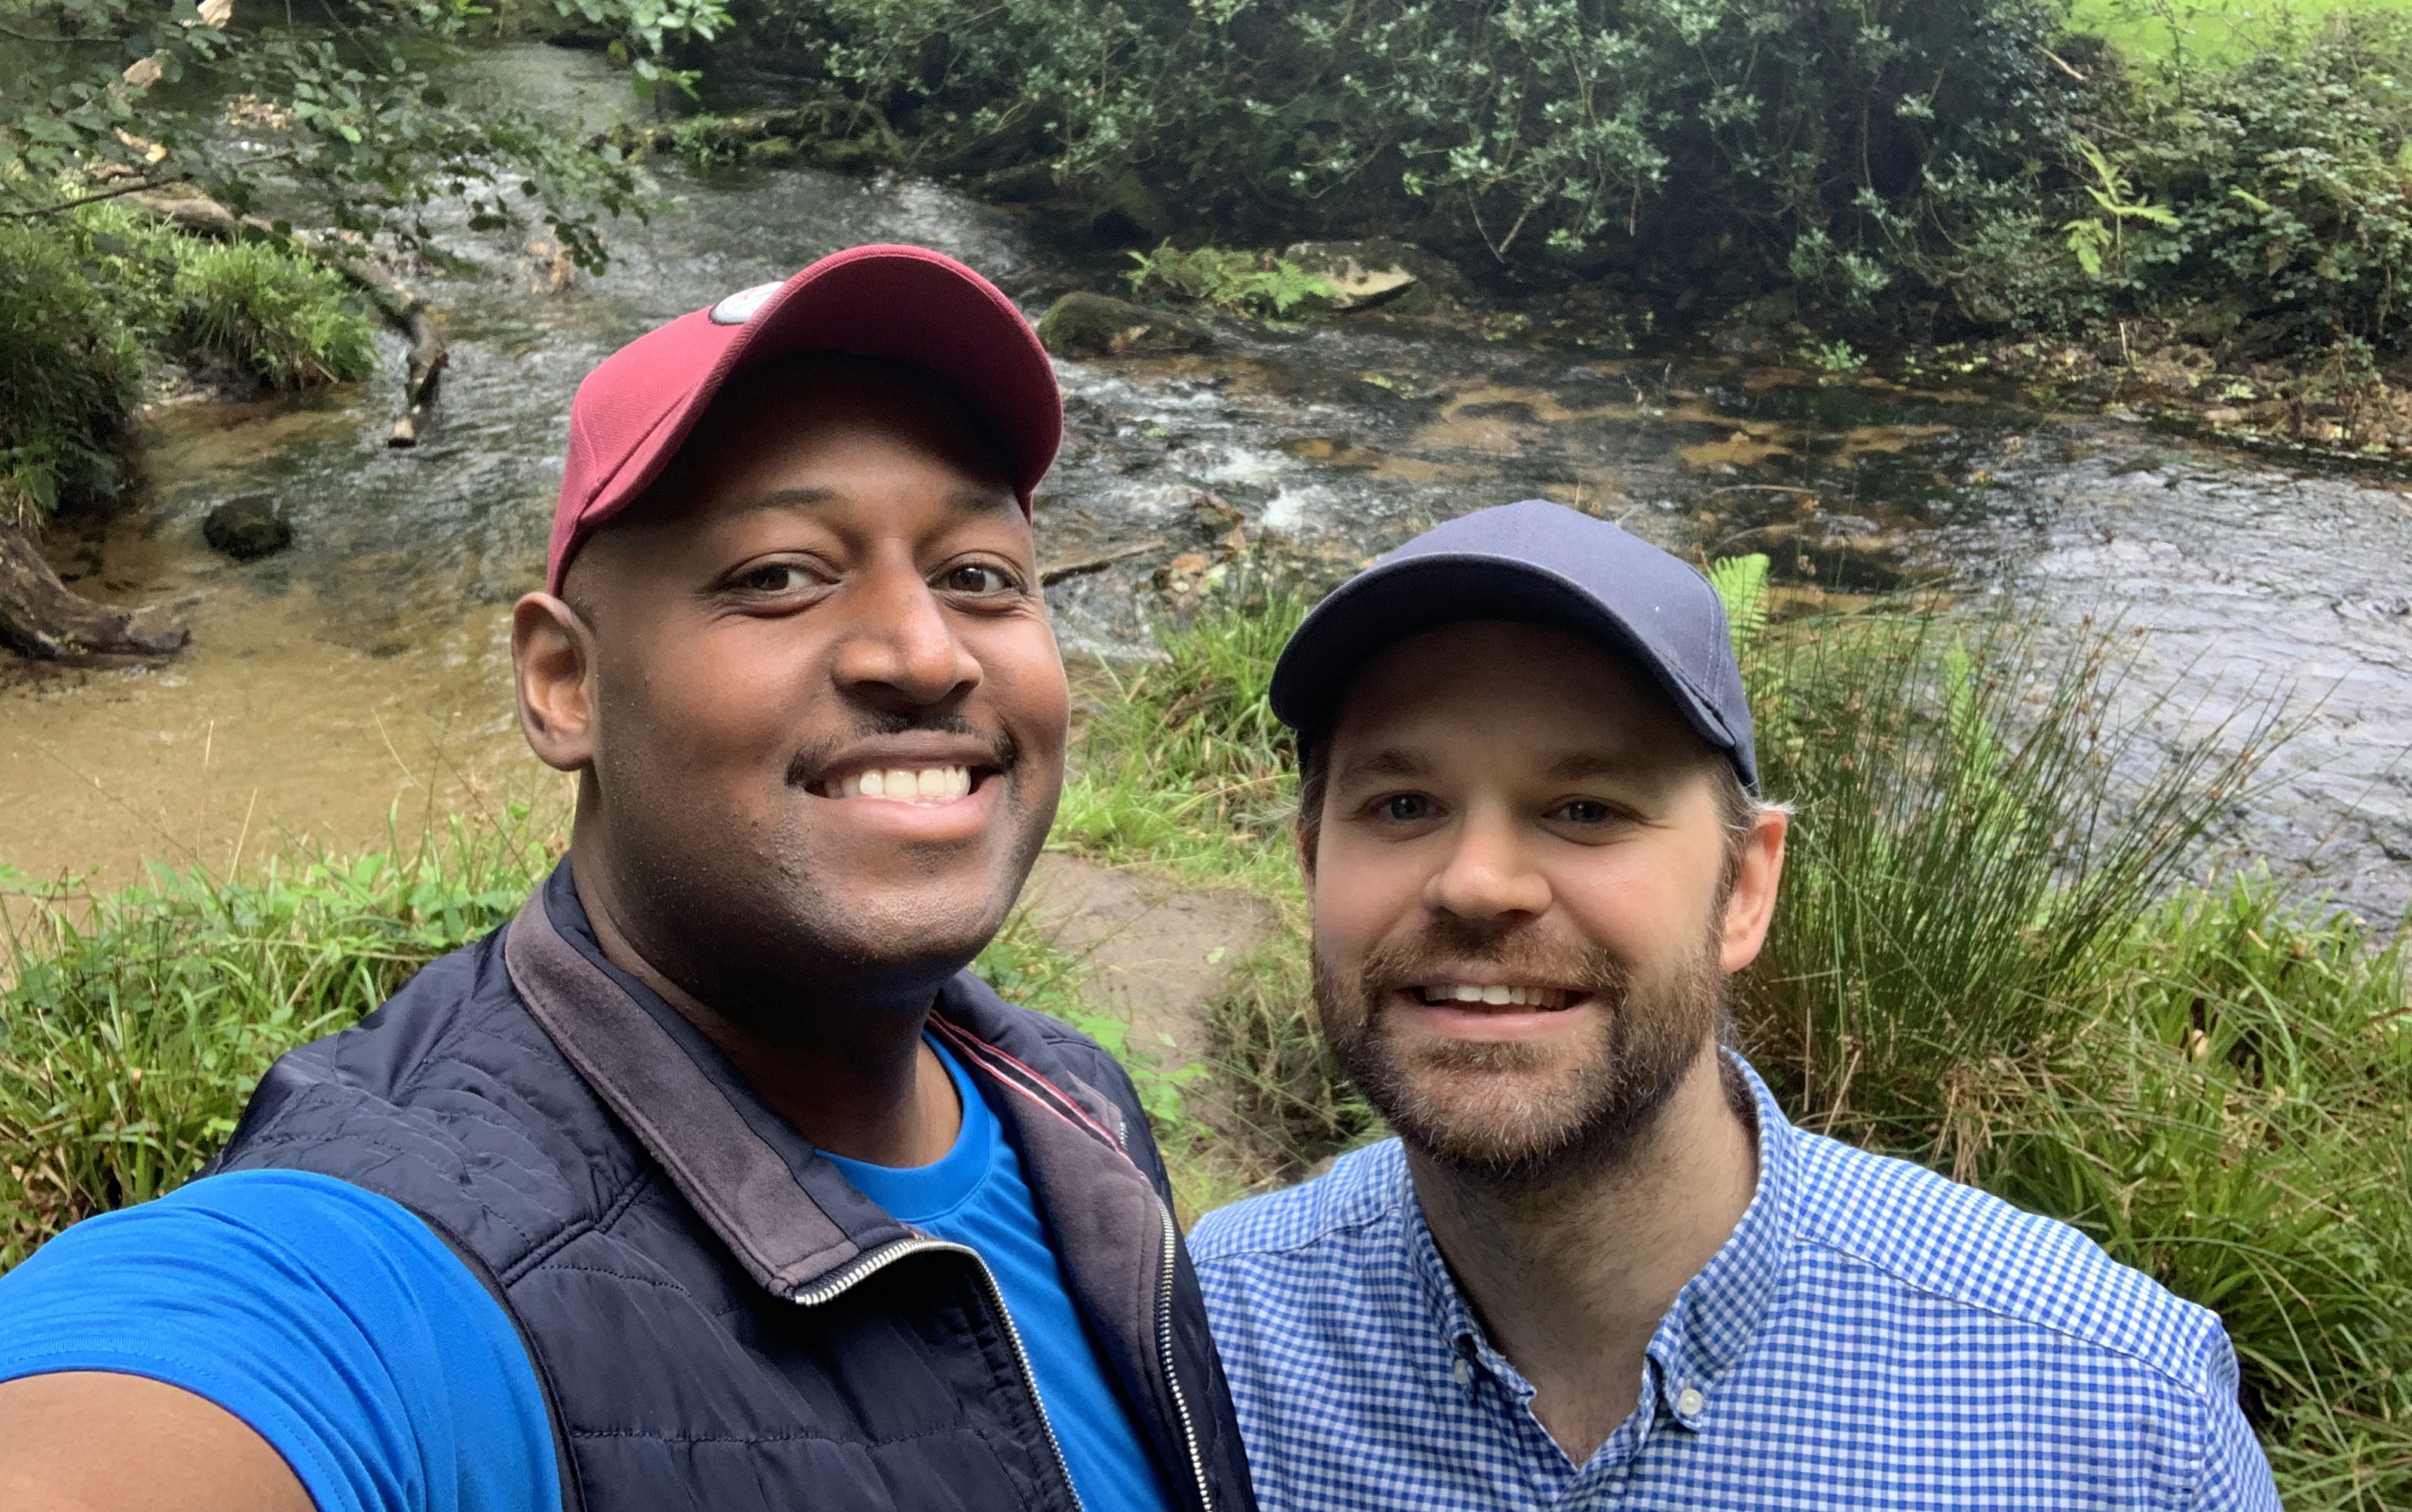 Christian Azolan and partner Konrad out for a walk